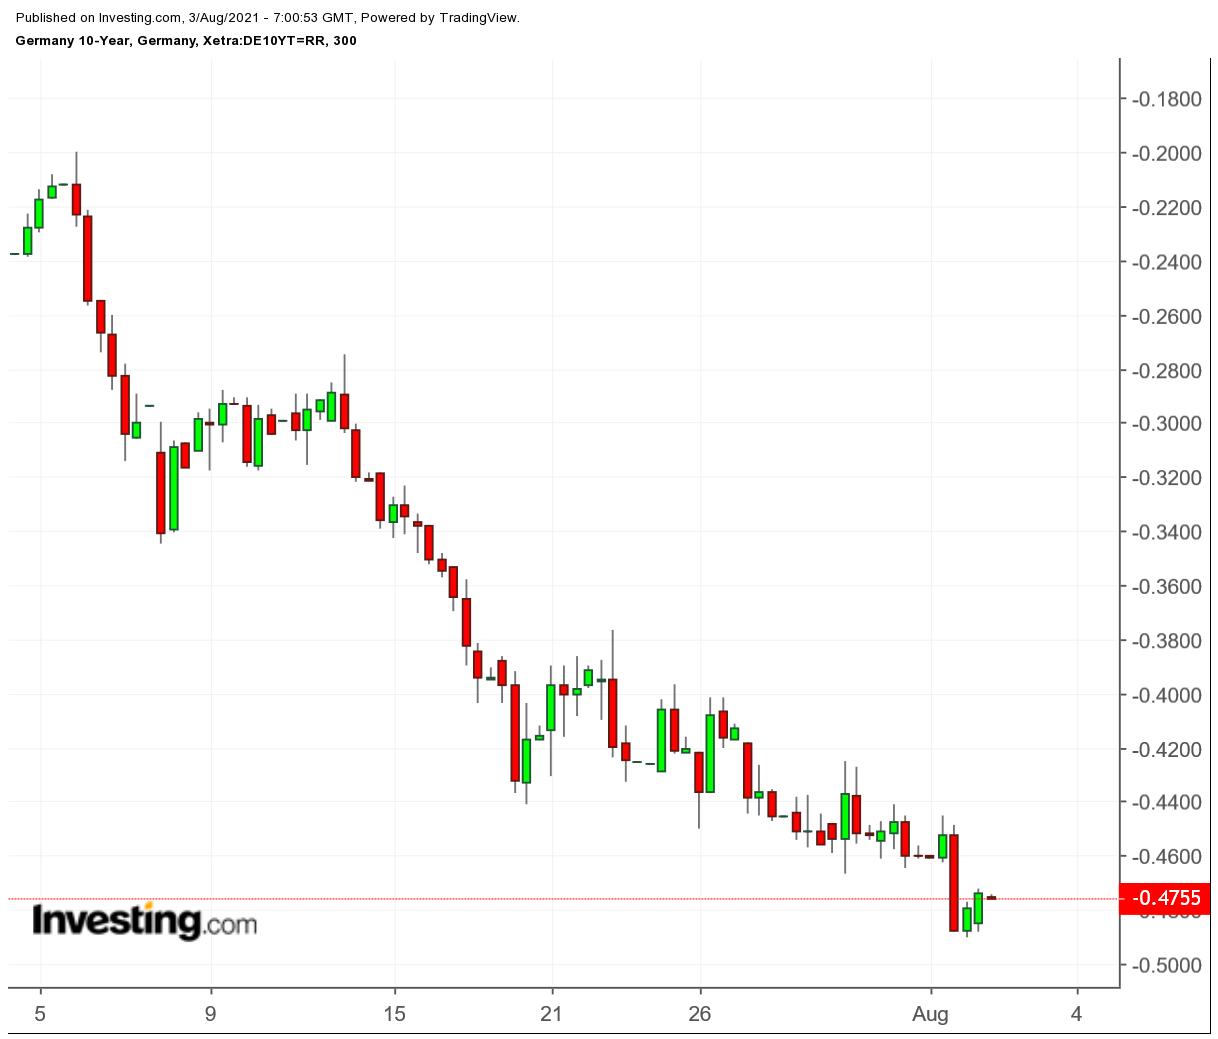 10-year German Bond 300 Minute Chart